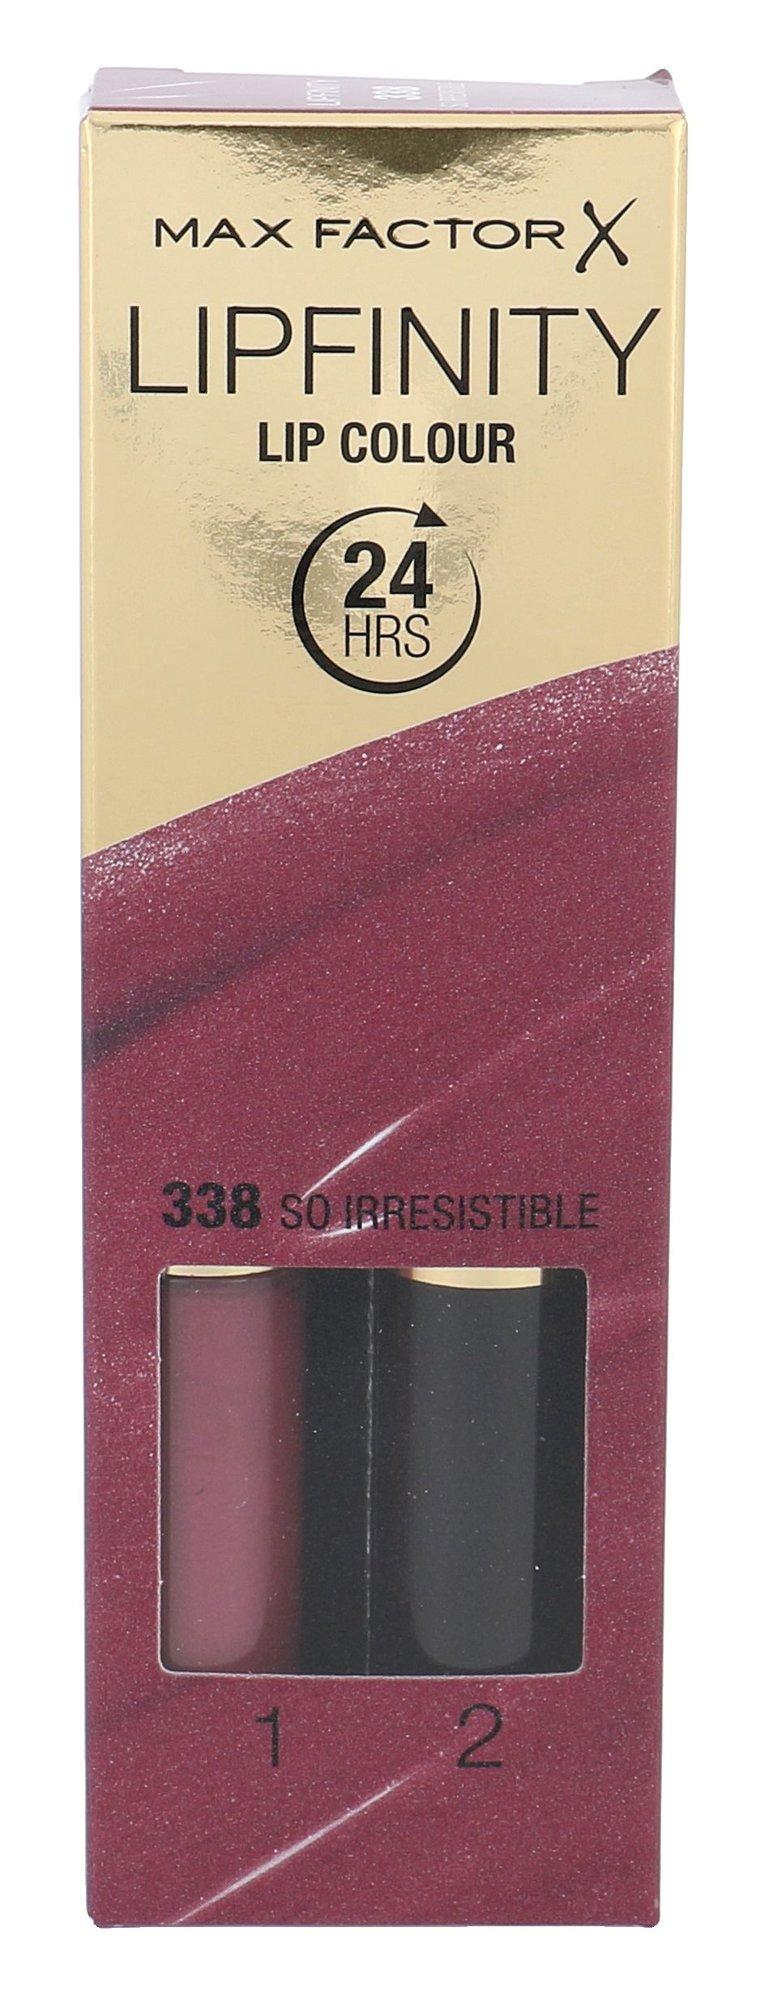 Max Factor Lipfinity Cosmetic 4,2ml 338 So Irresistible